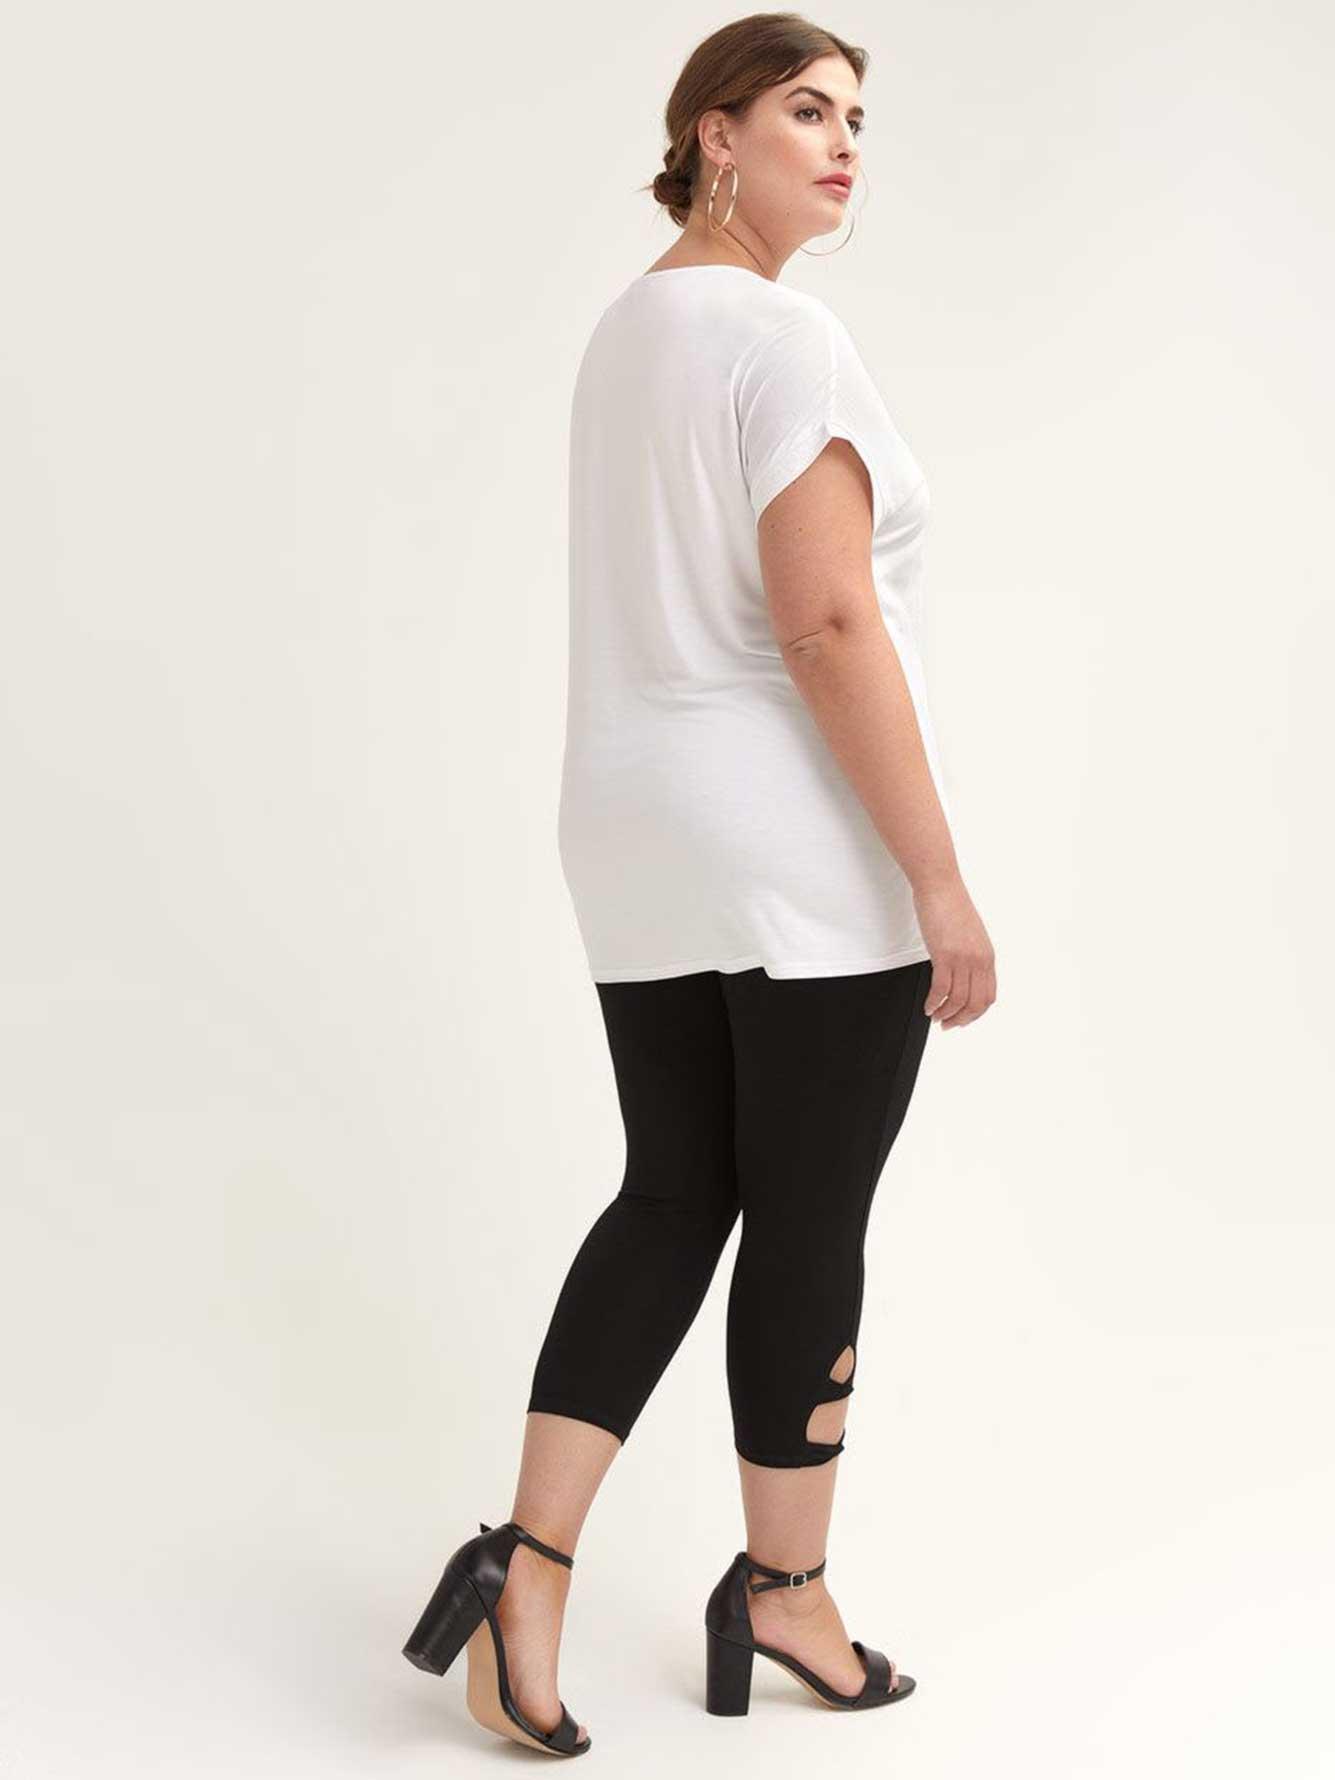 6c40b882720d2 Solid Capri Leggings with Twist Side Detail | Penningtons